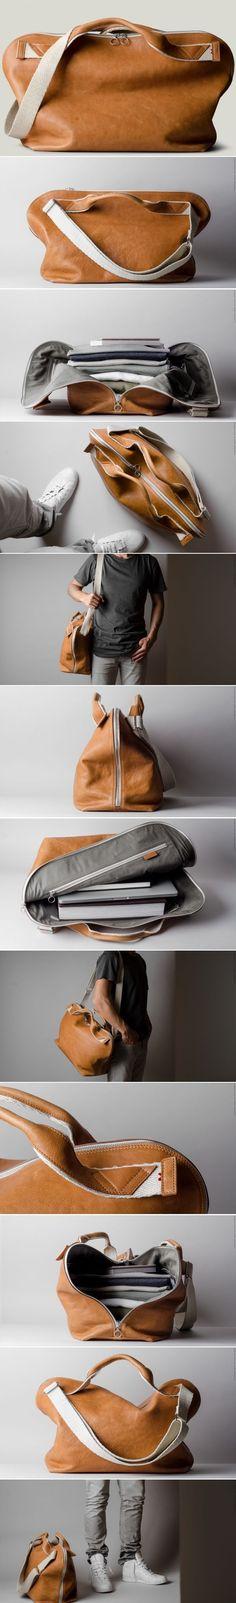 tašky #bag #louisvuitton #bagsprada #bolsasprada